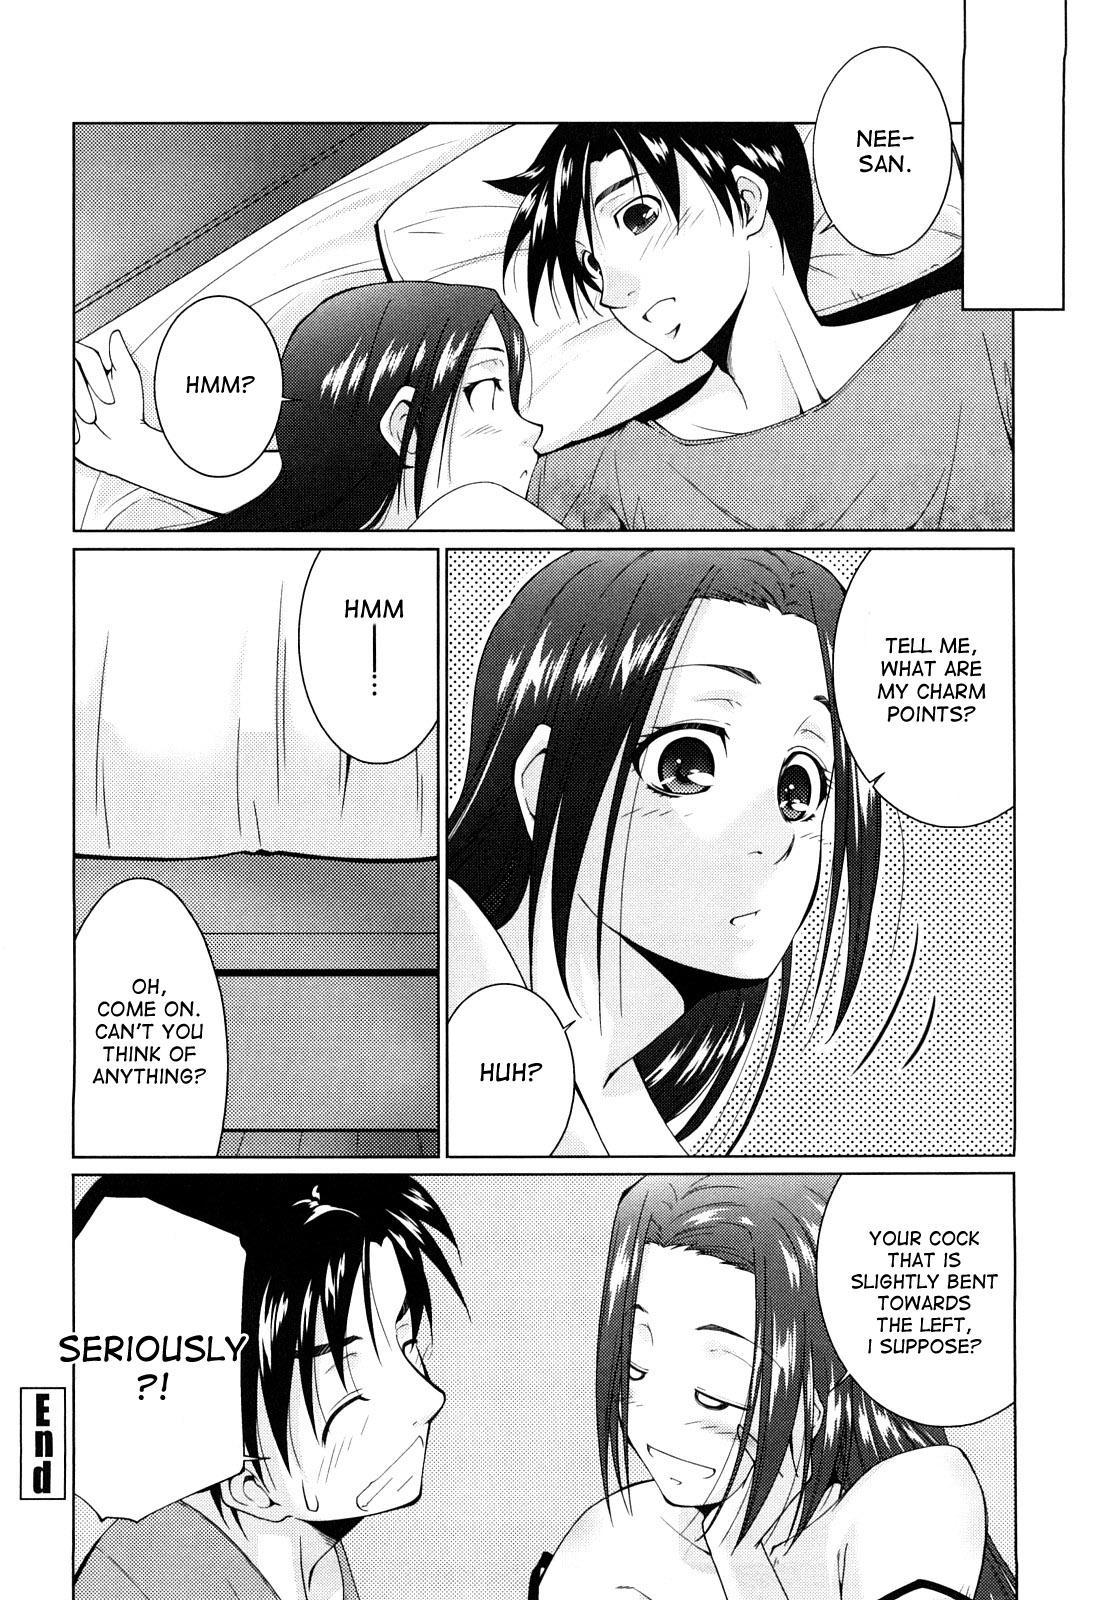 [Touma Itsuki] Ane-sama Inkou - Sister's Sexy Smell Ch. 1-6 [English] [desudesu] [Decensored] 51